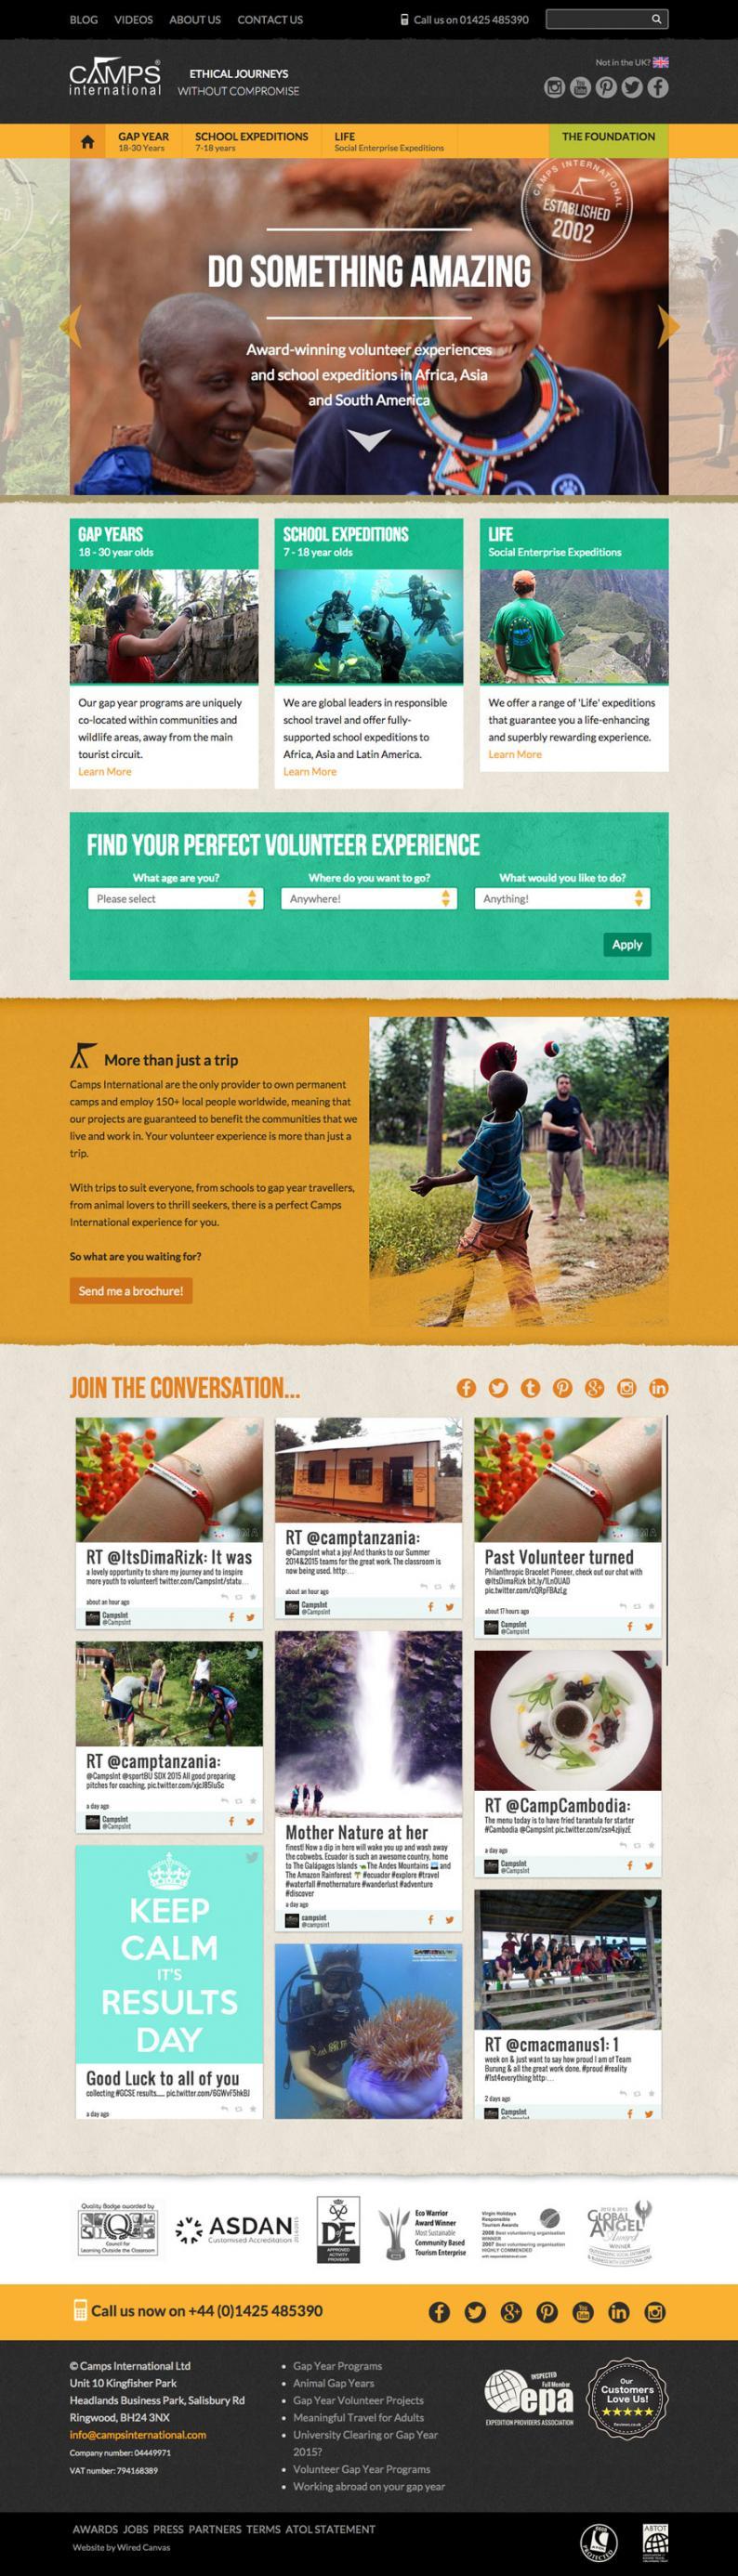 Camps International Website Desktop Design